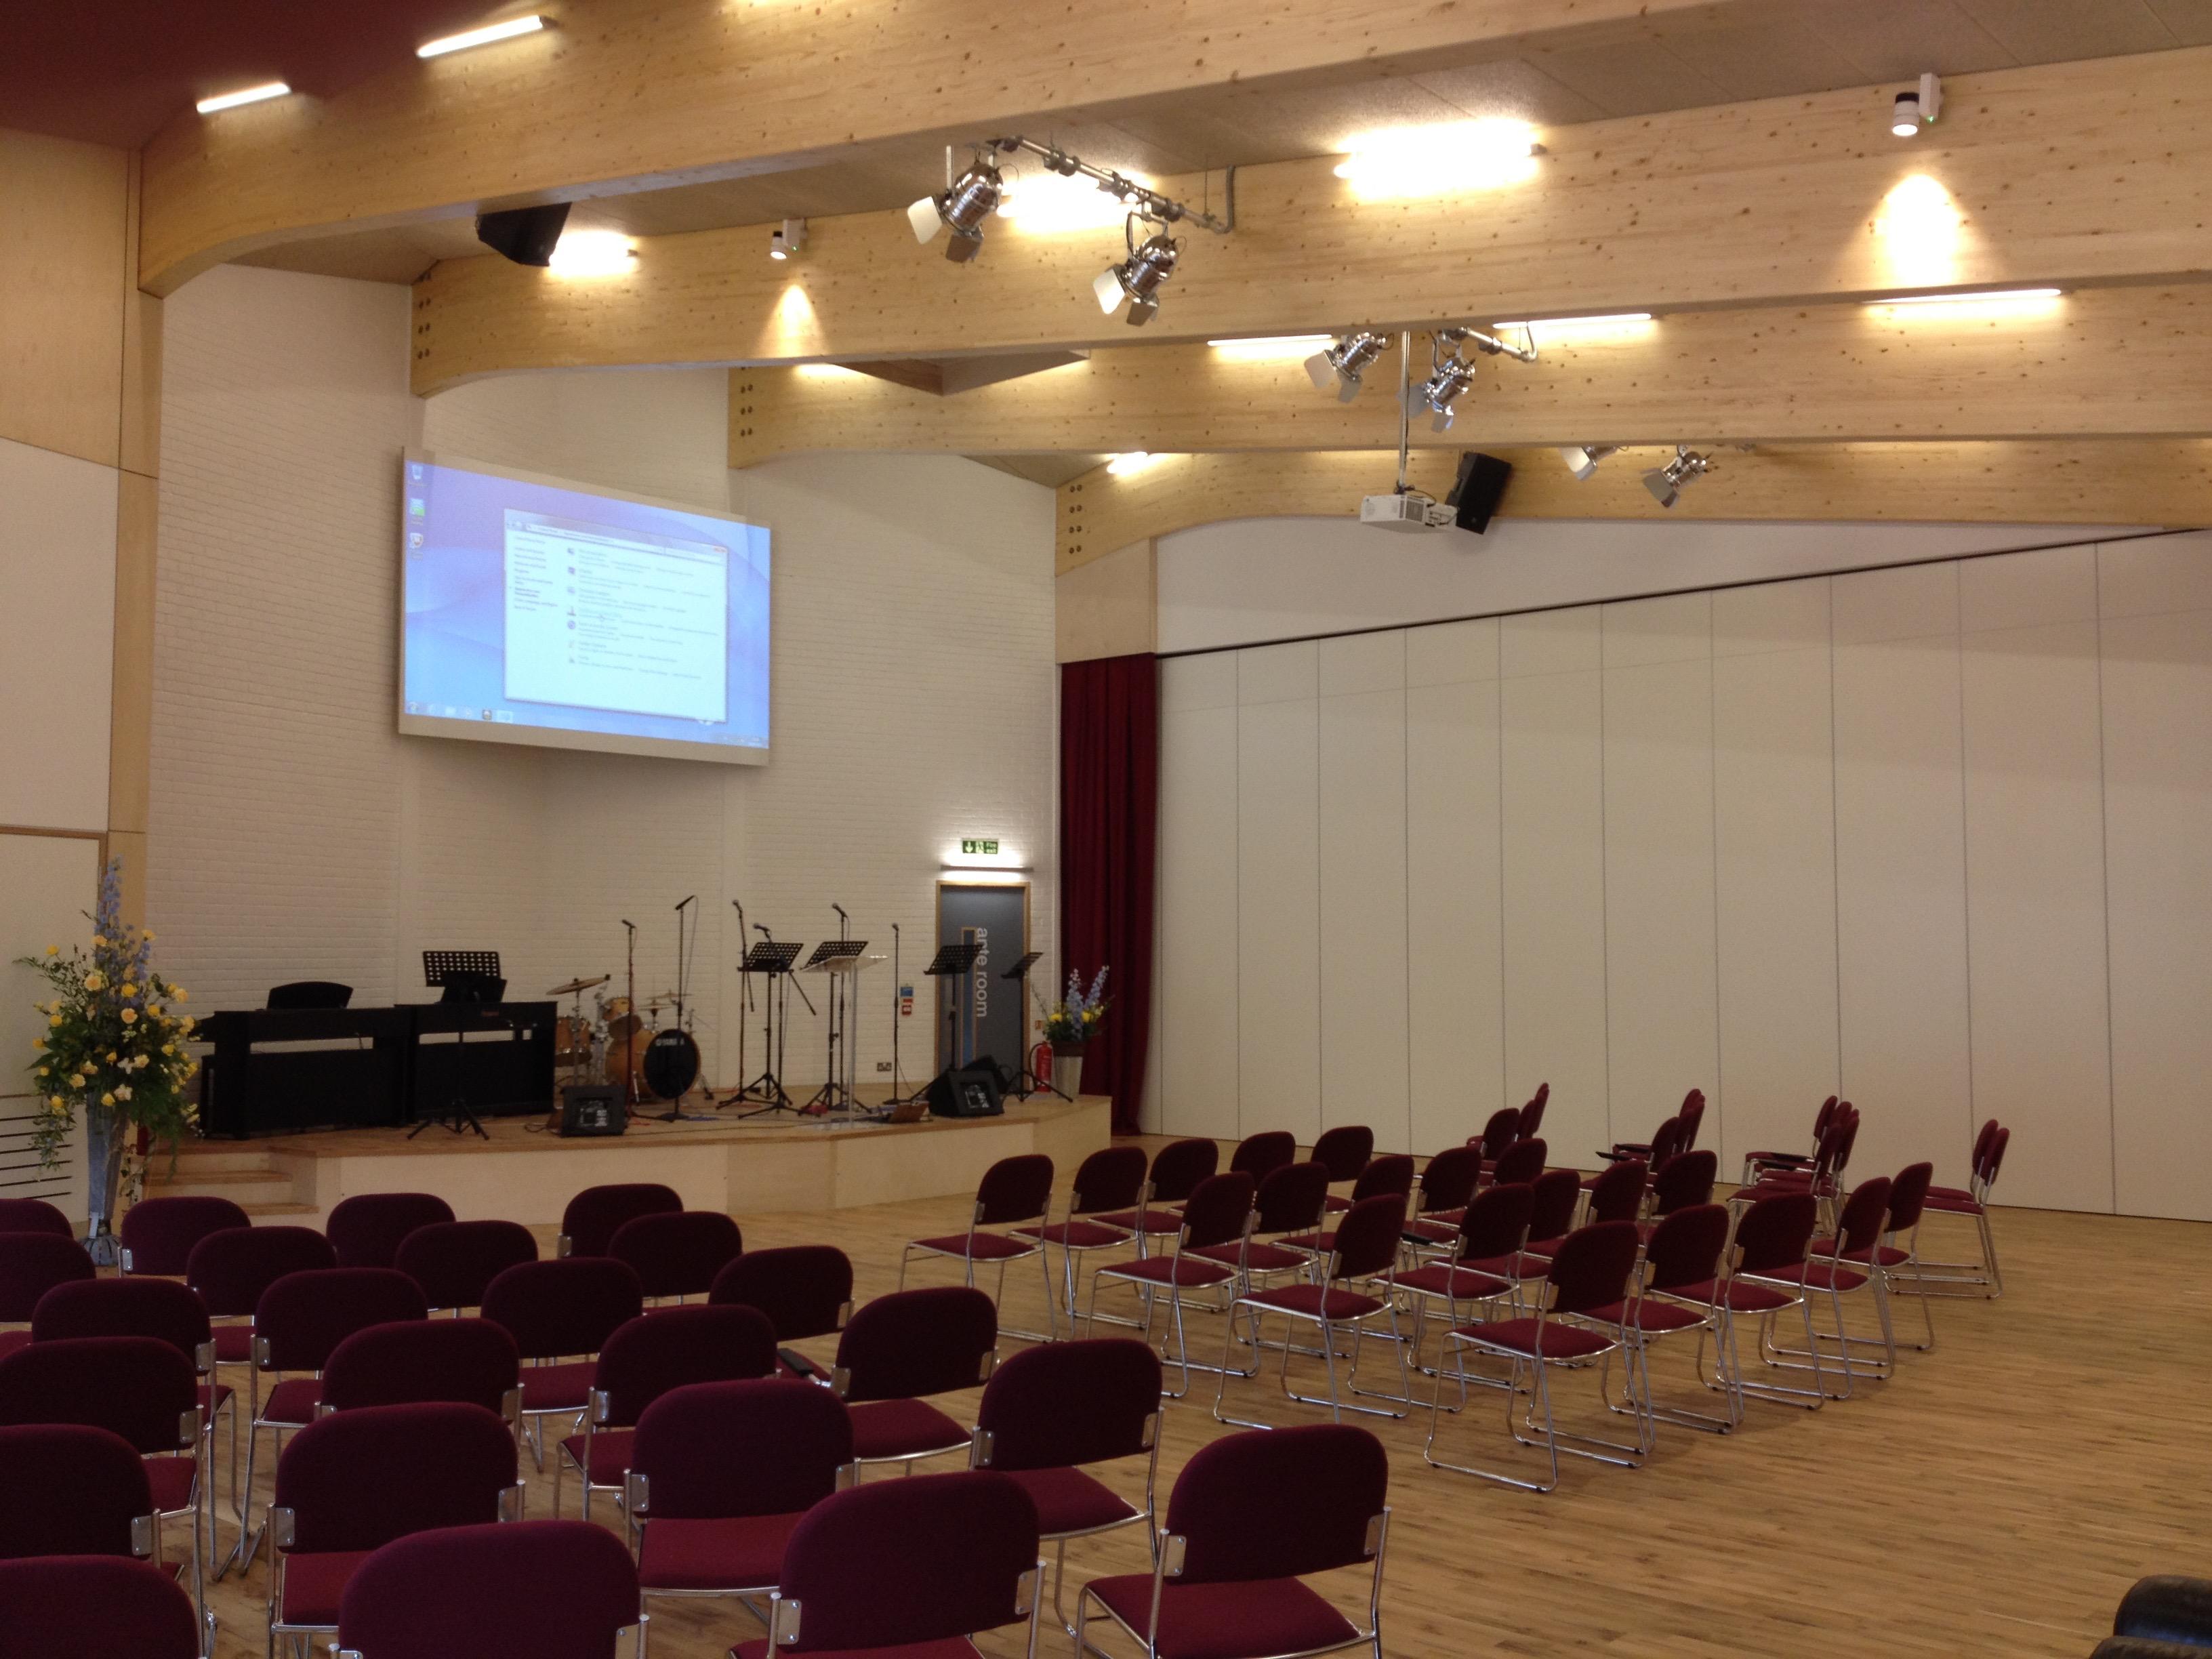 Newtech Southern Church Sound And Av System